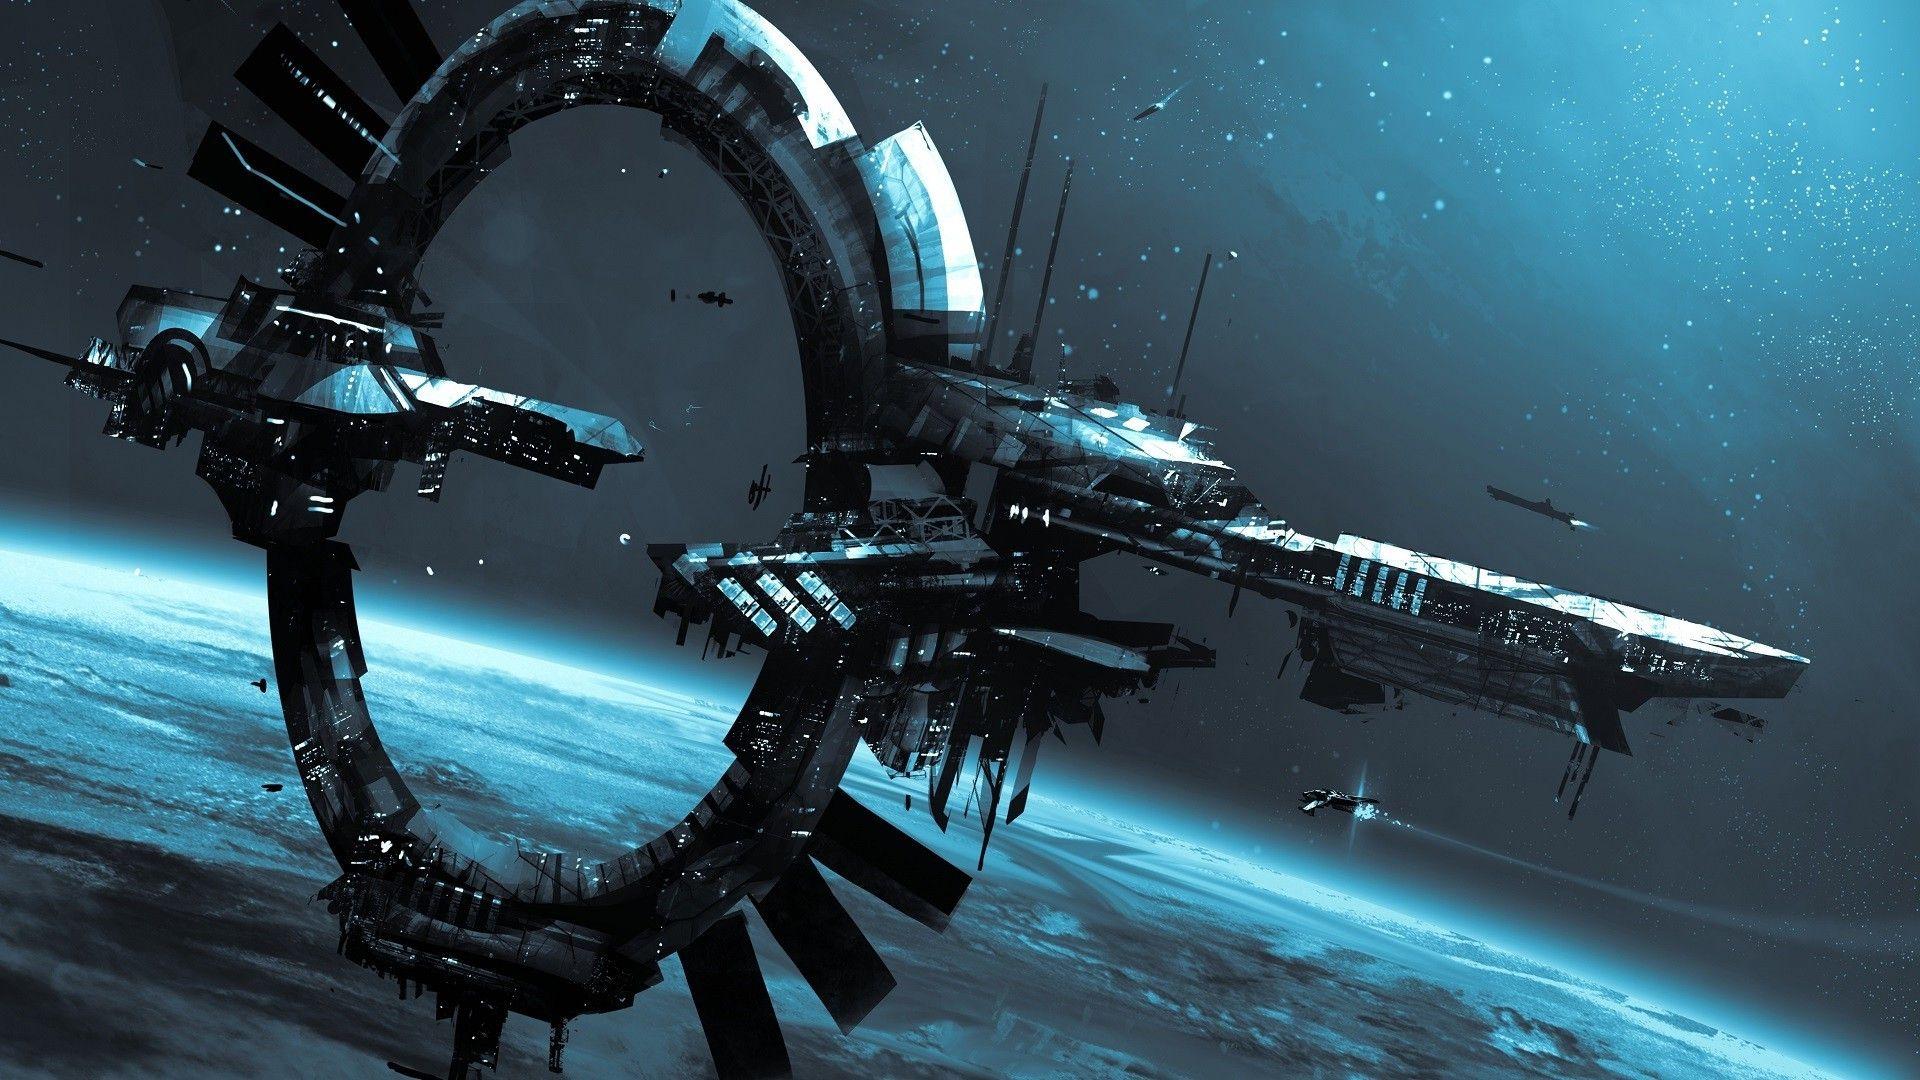 space spaceship star citizen idris space station